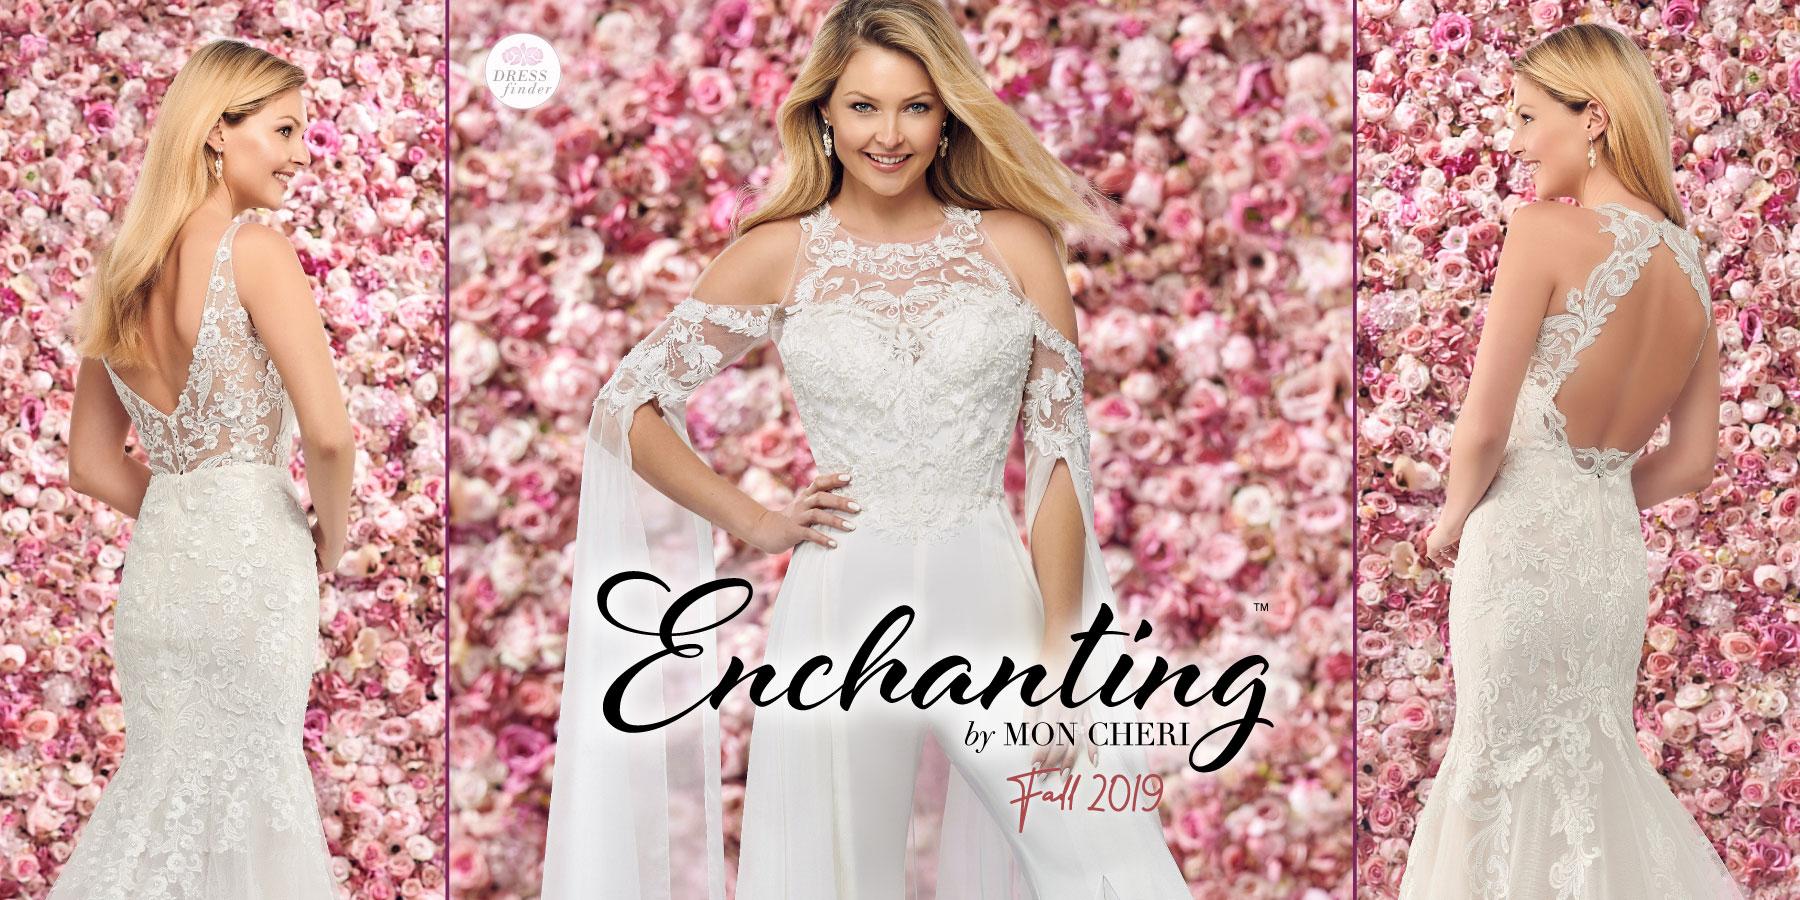 Enchanting by Mon Cheri